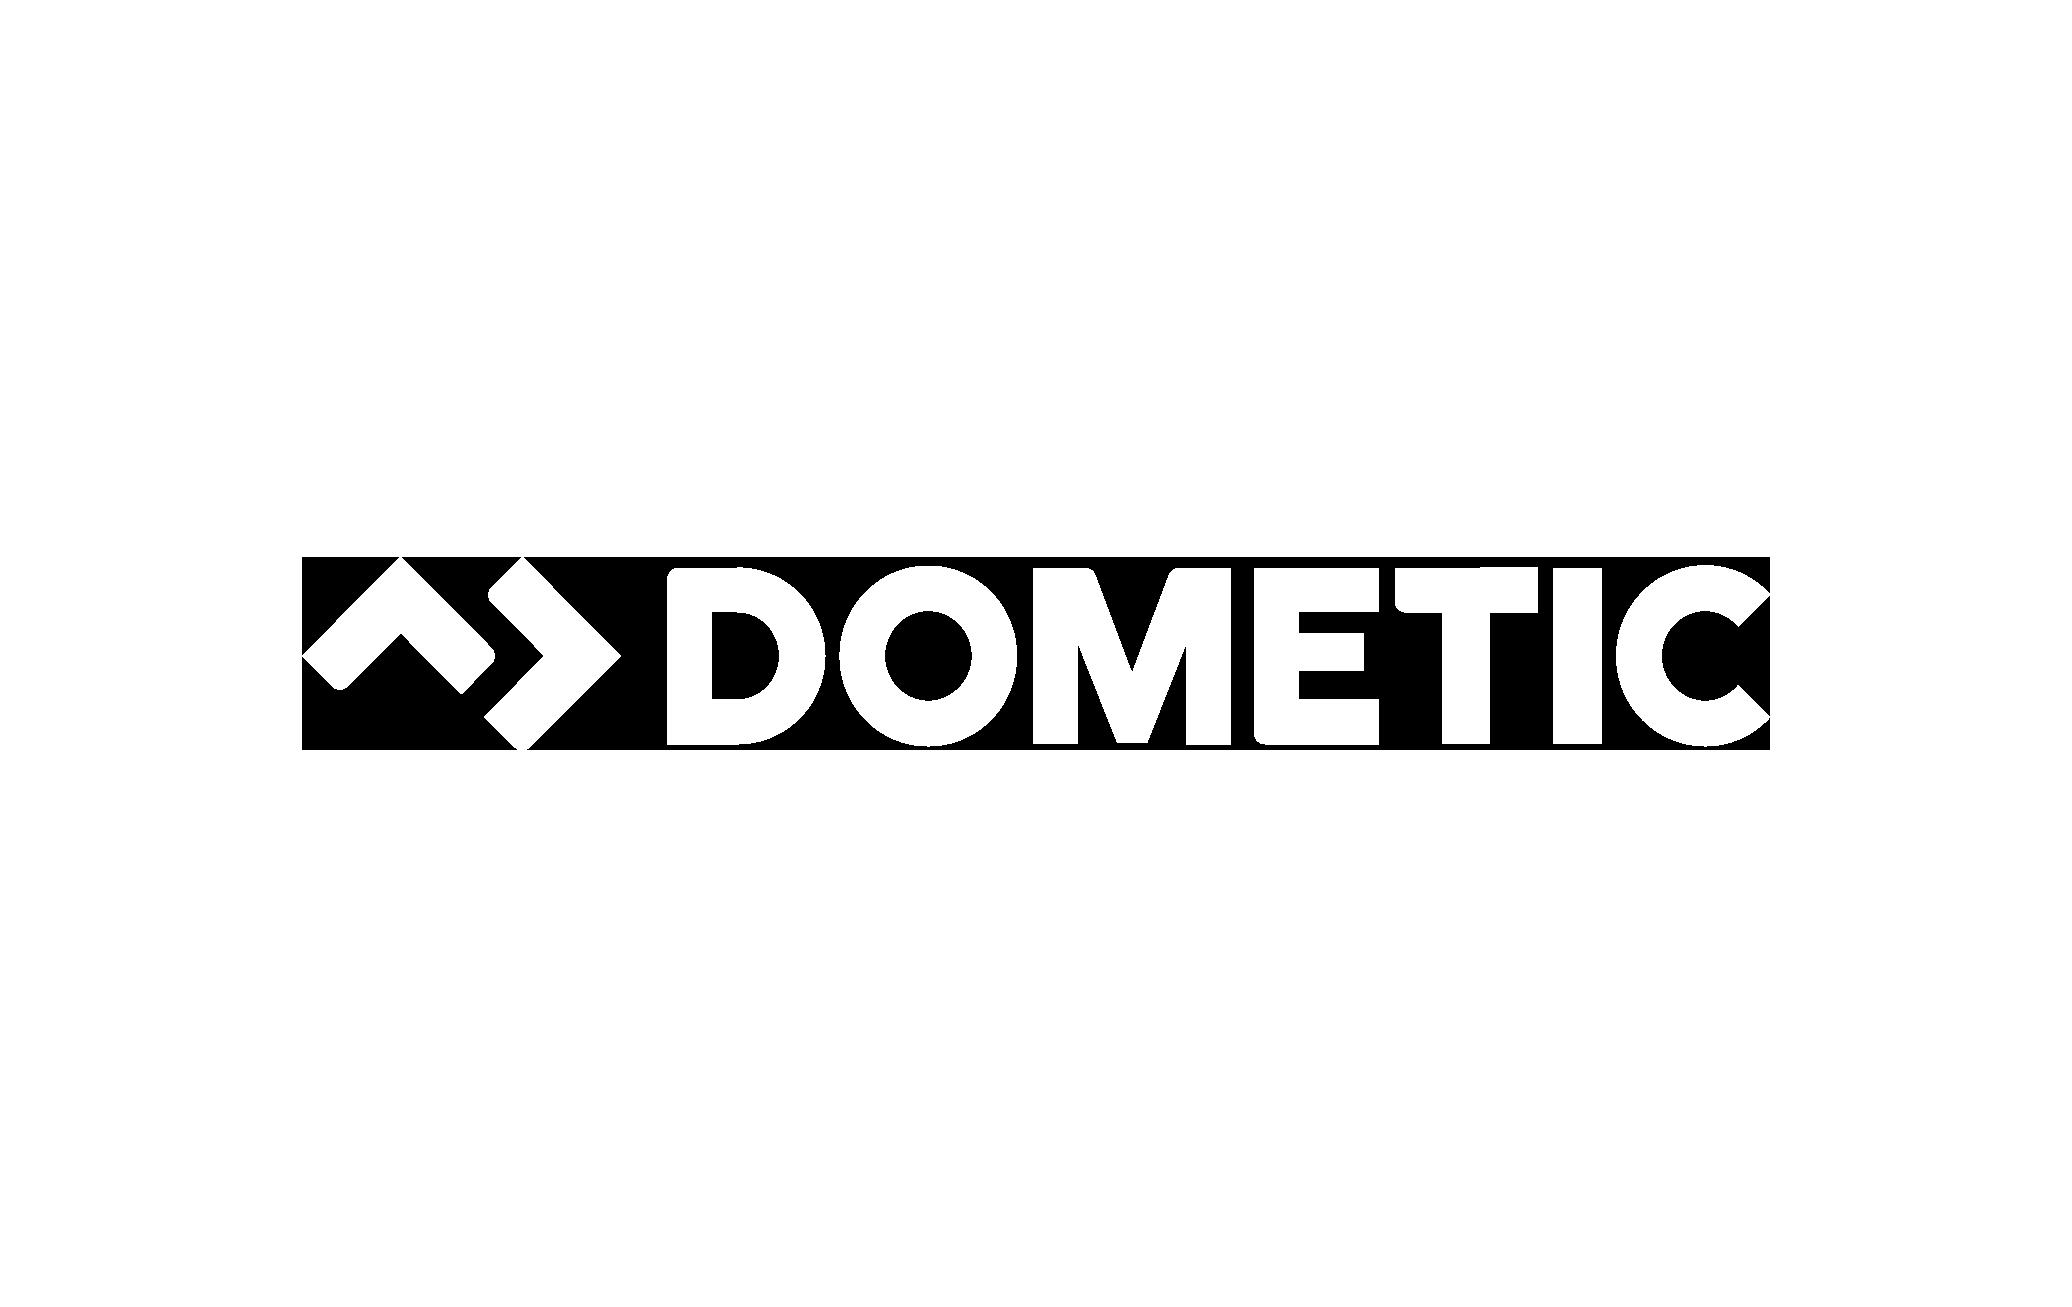 Website Logos_v03 Dometic.png